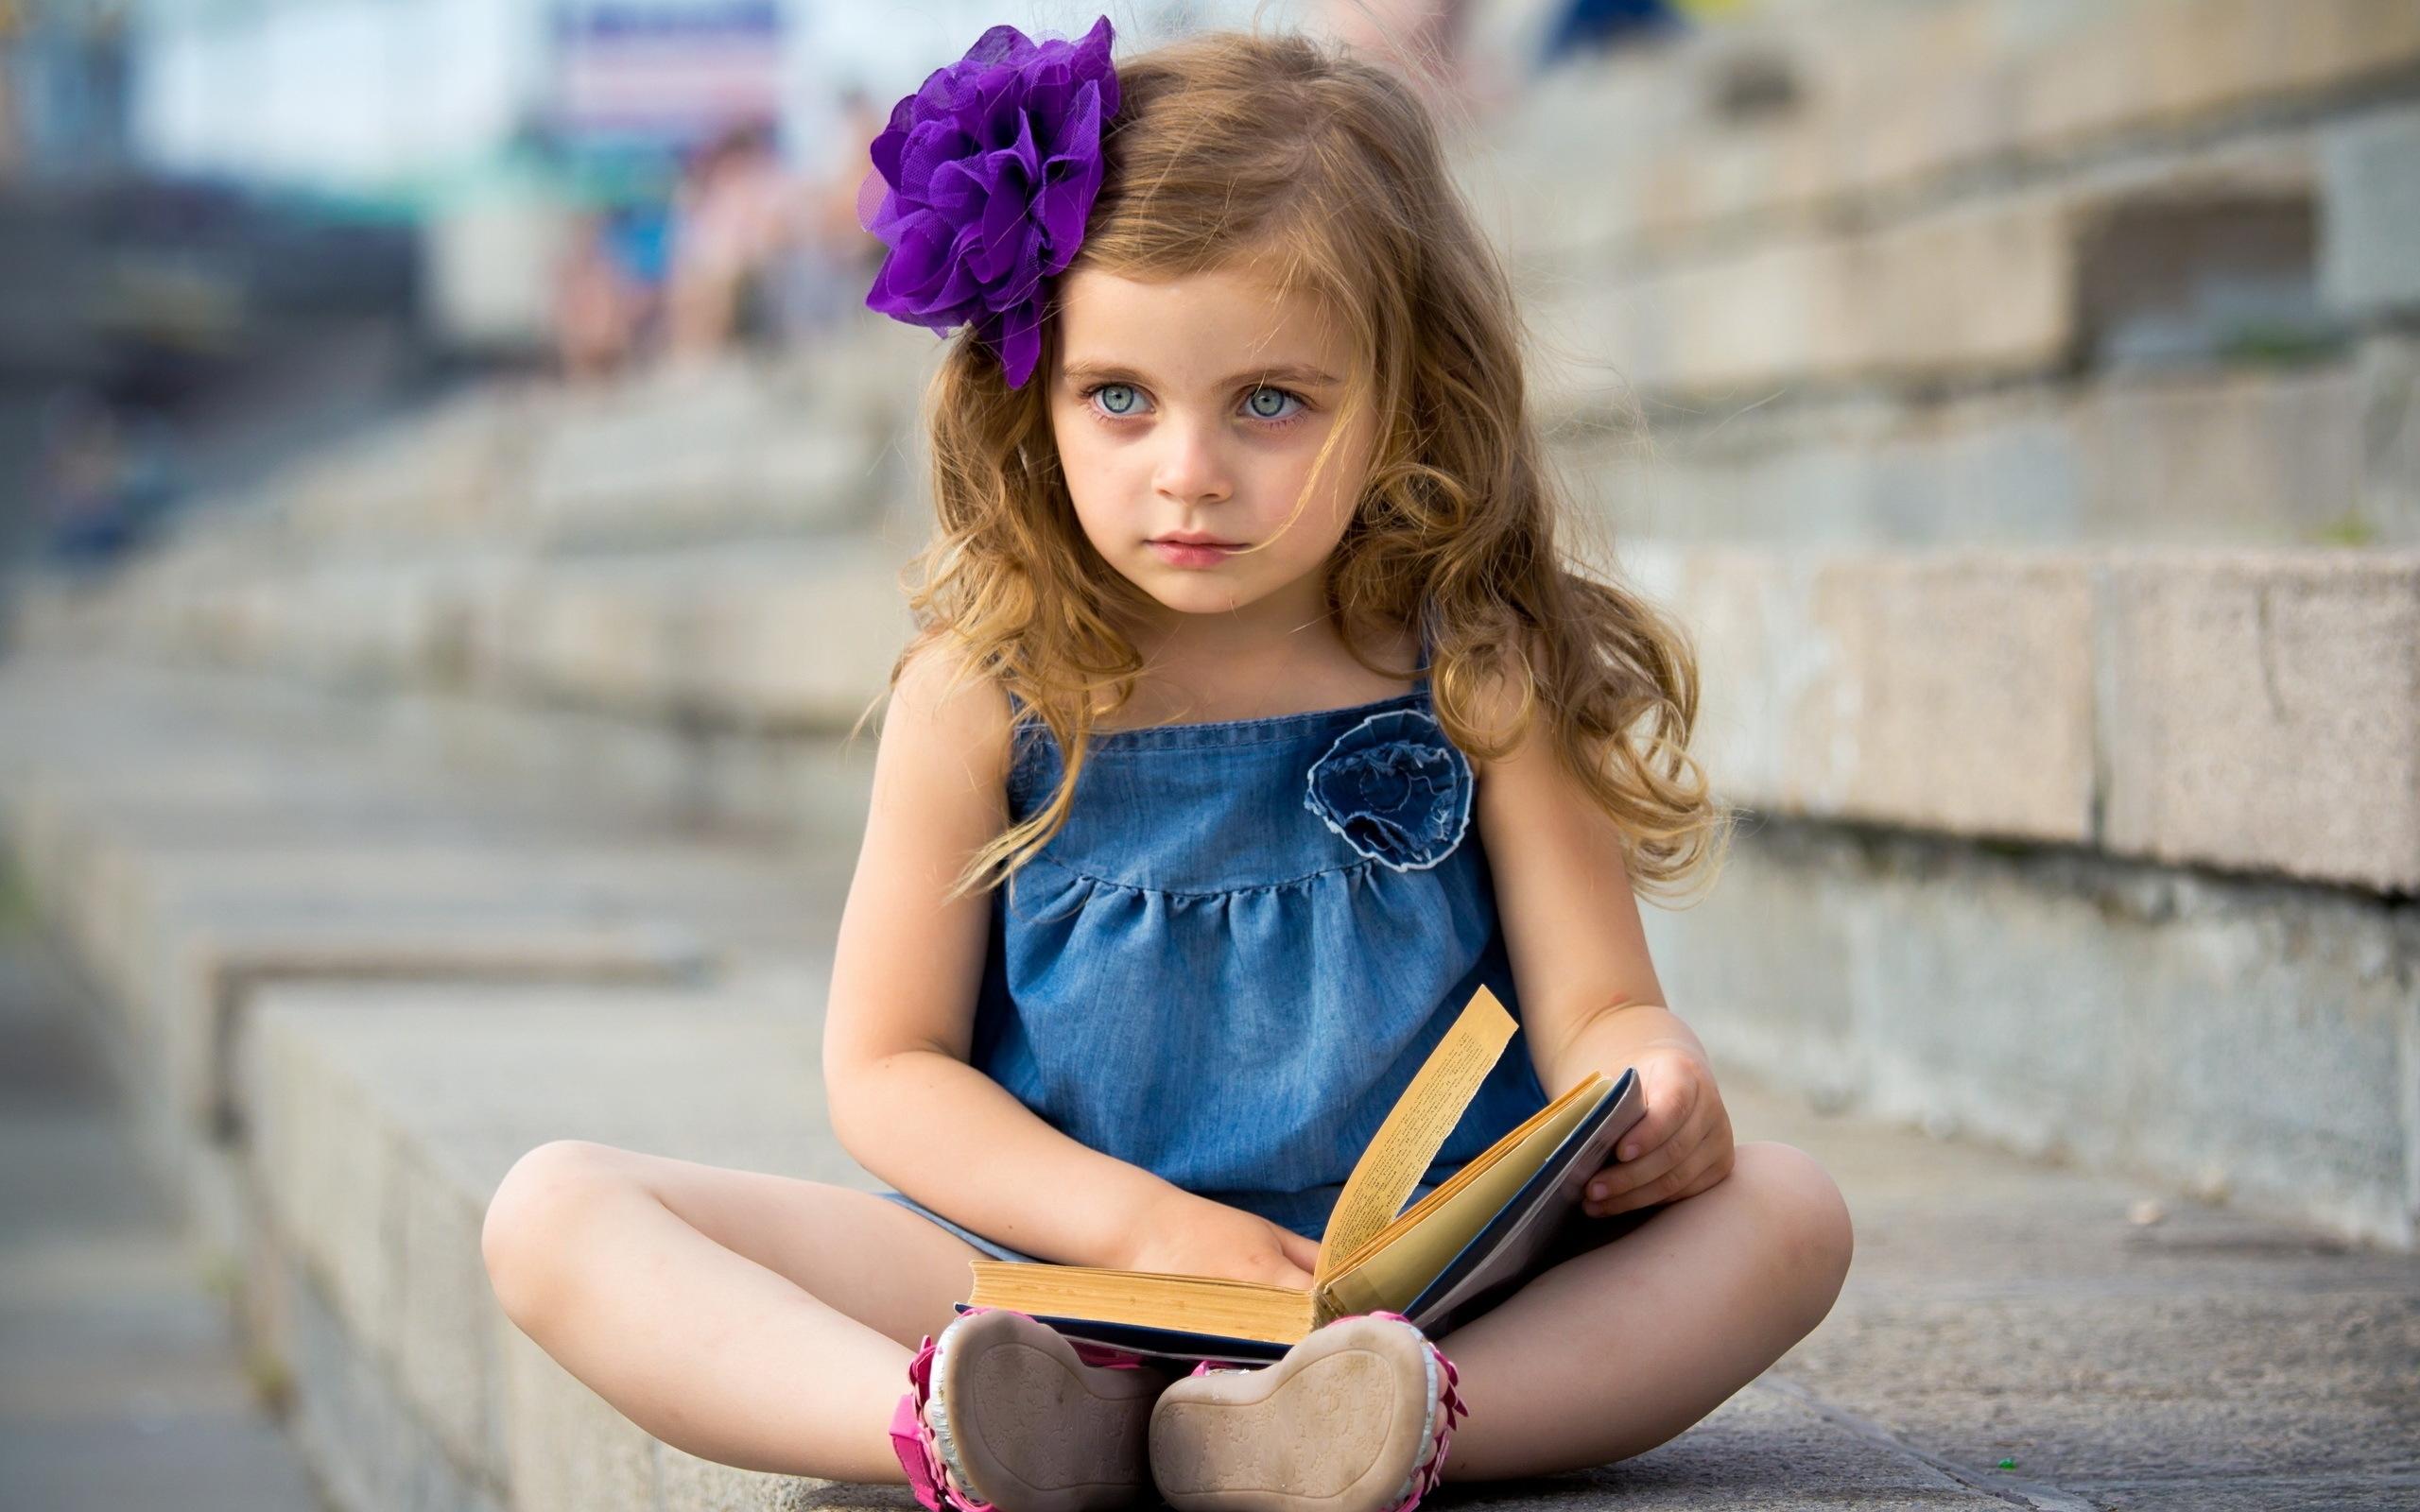 Cute Little Girl Mac Wallpaper Download Mac Wallpapers Download 2560x1600